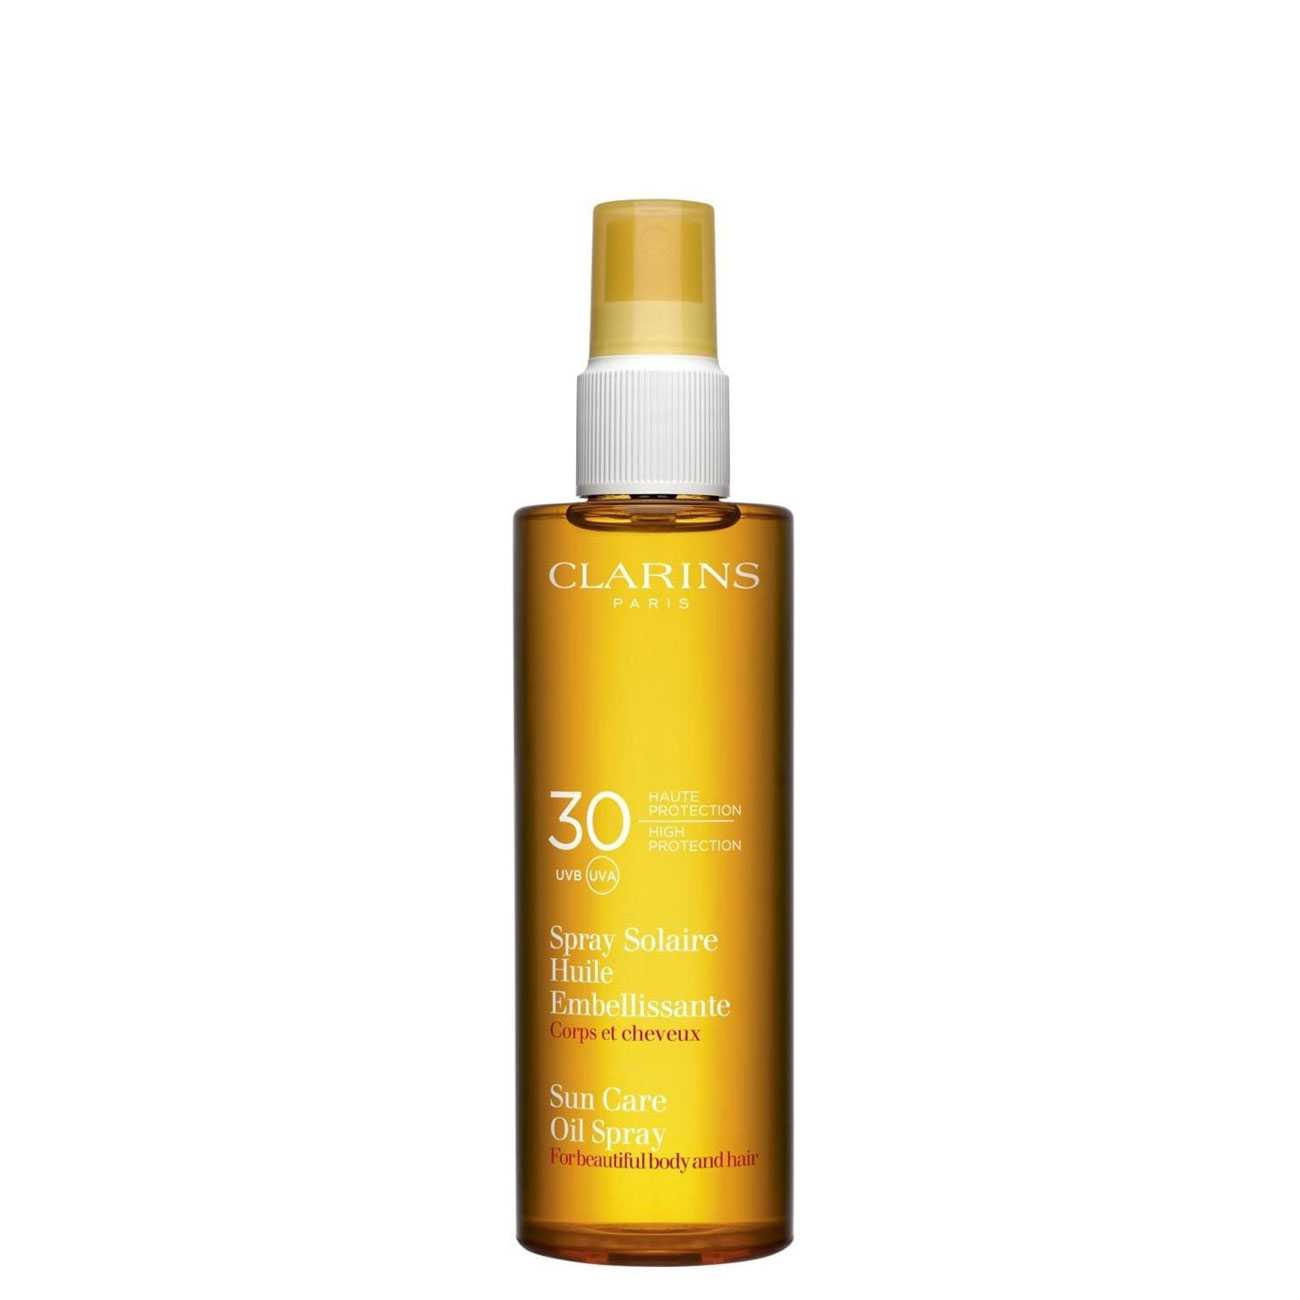 Clarins Sun Care Mist SPF 30